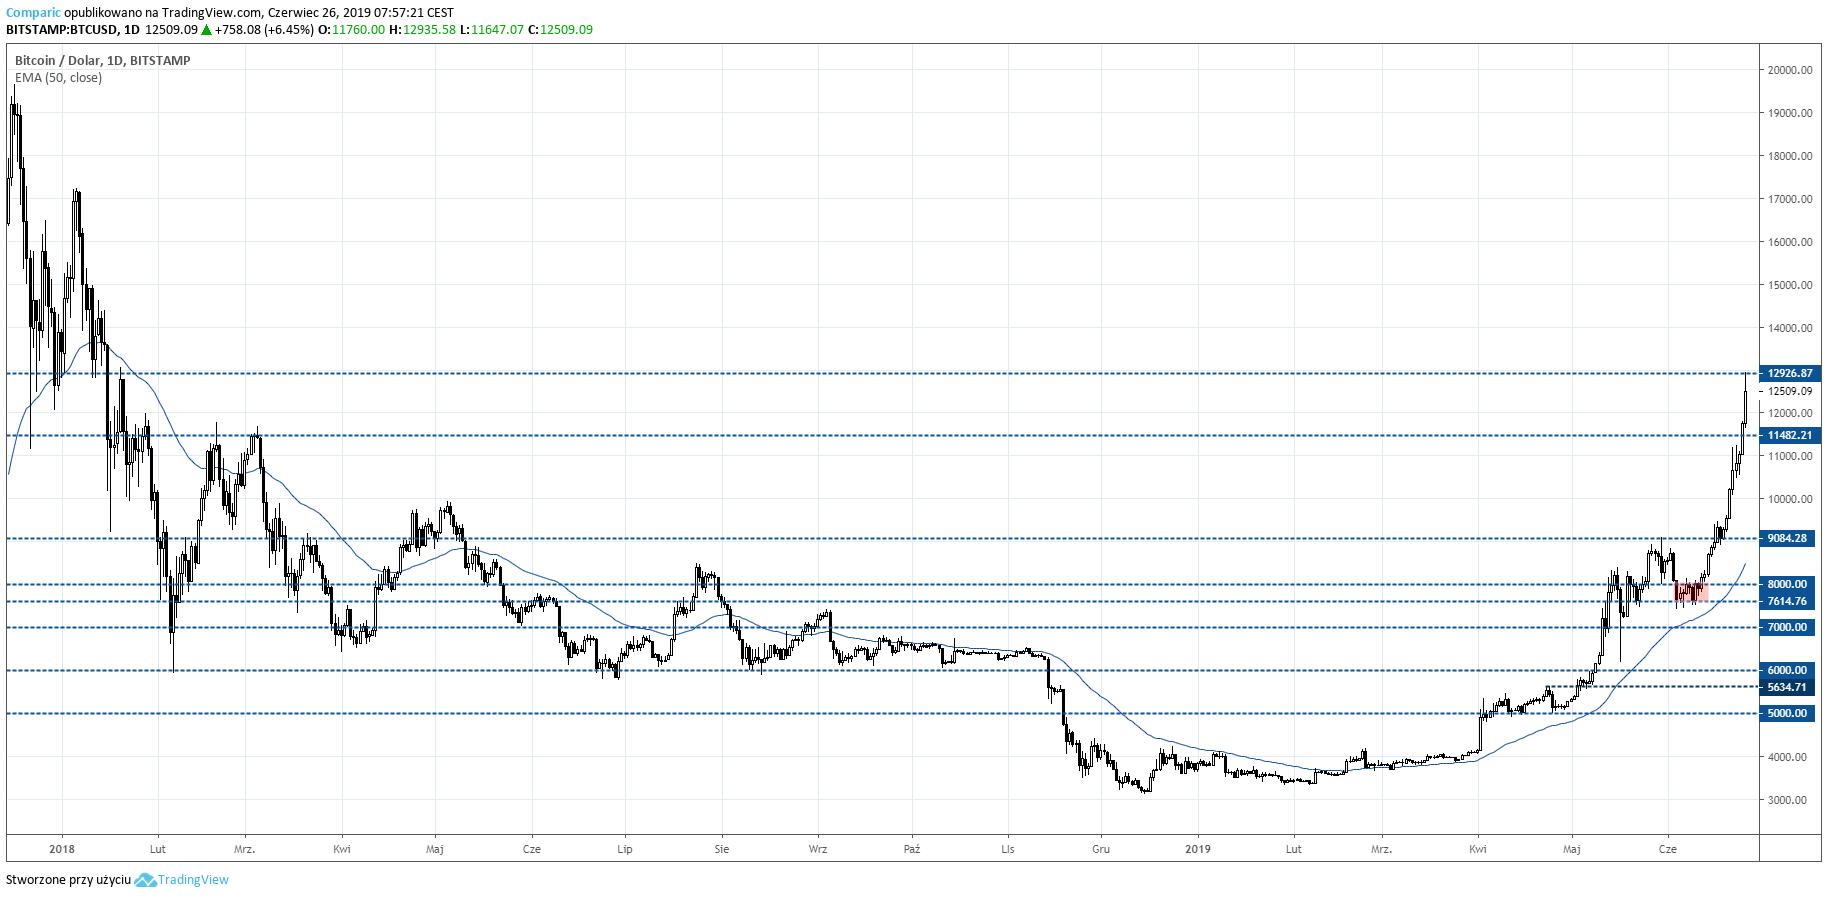 kurs Bitcoina 26 czerwca